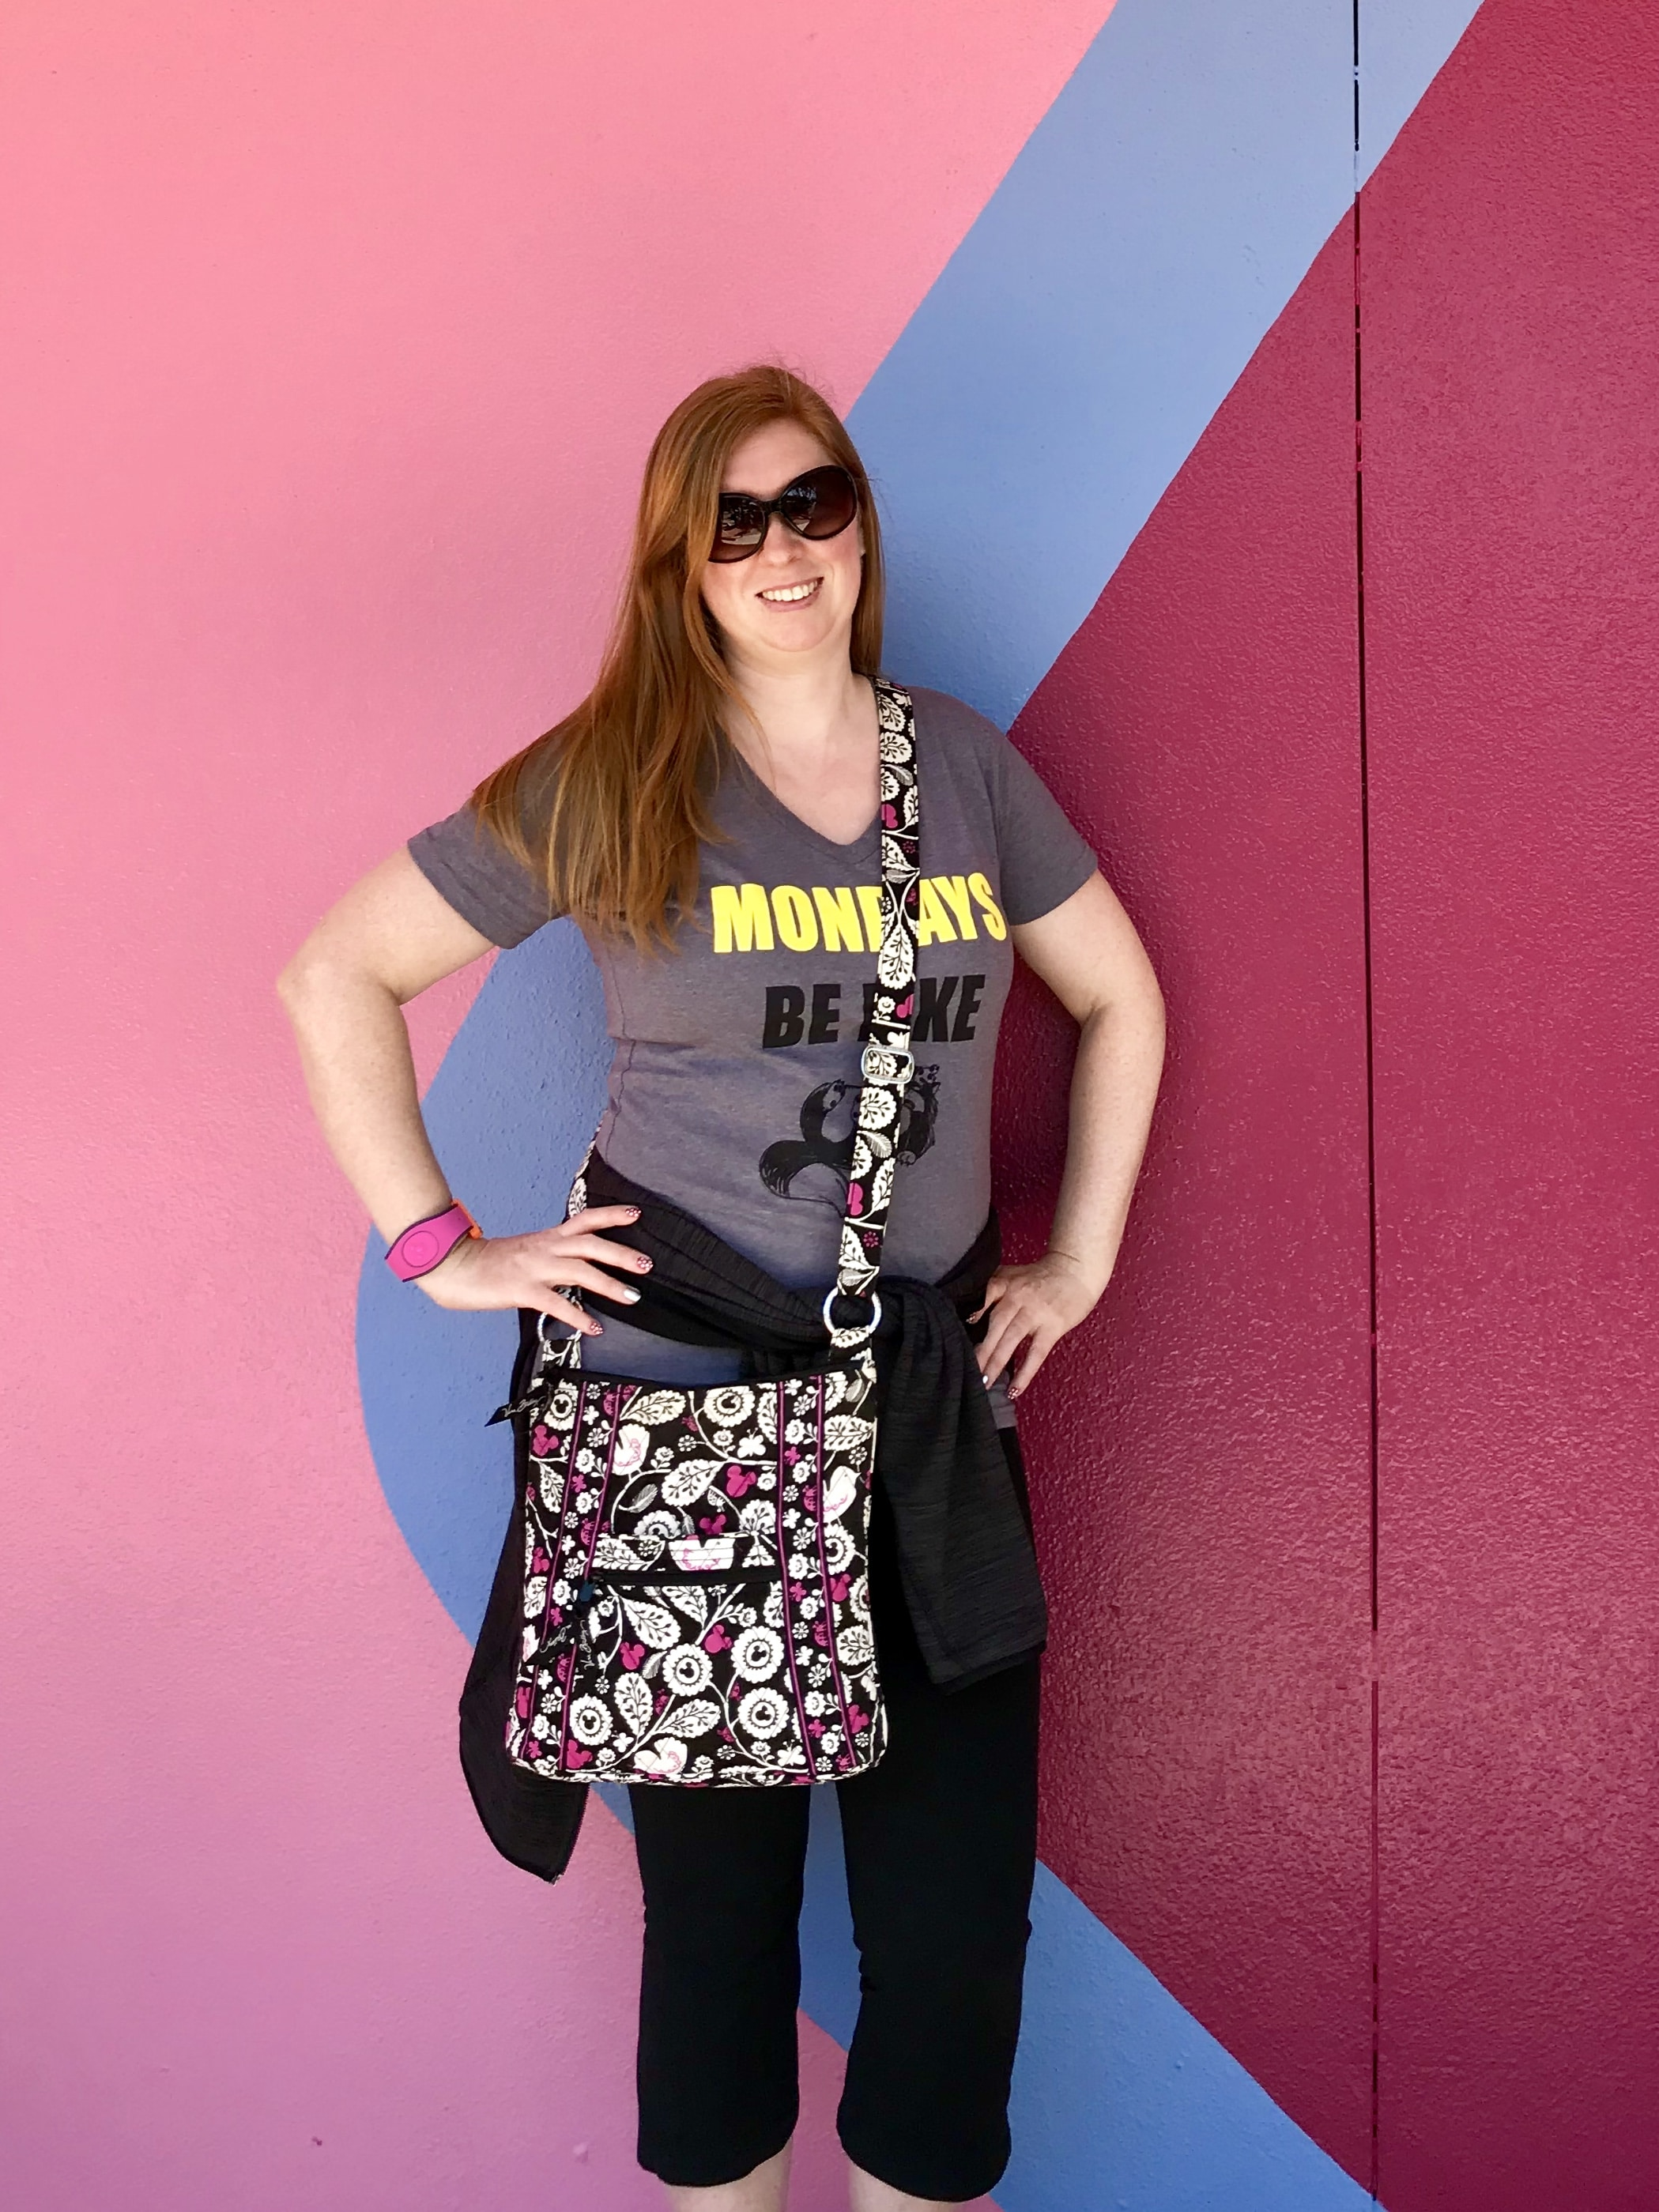 My Vera Bradley Hipster bag that I like to use as my Disney park bag